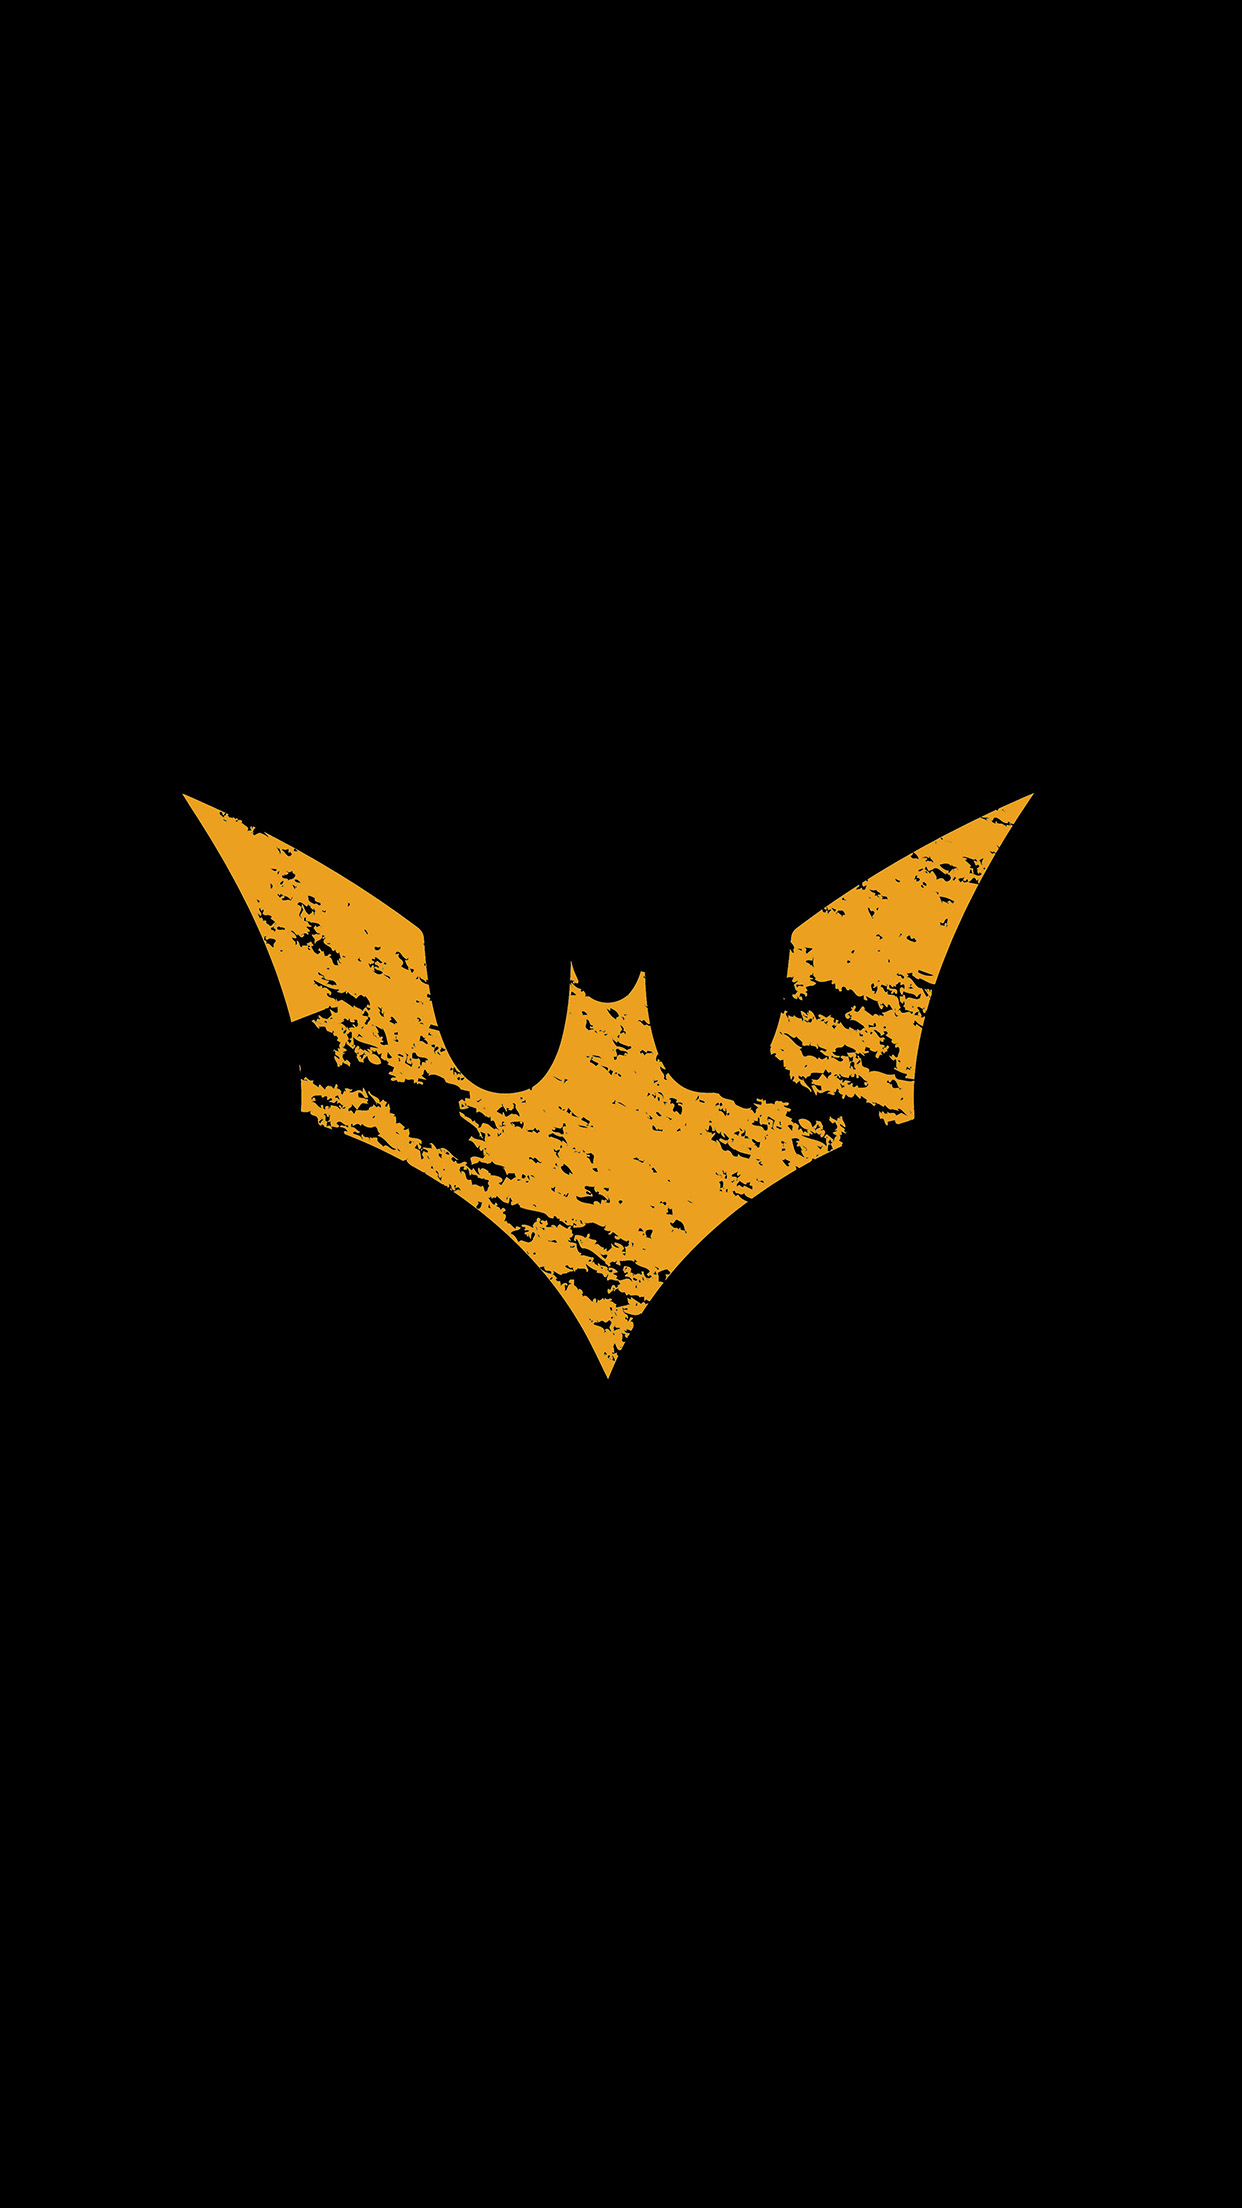 Iphonepaperscom Iphone Wallpaper Ap17 Batman Logo Yellow Dark